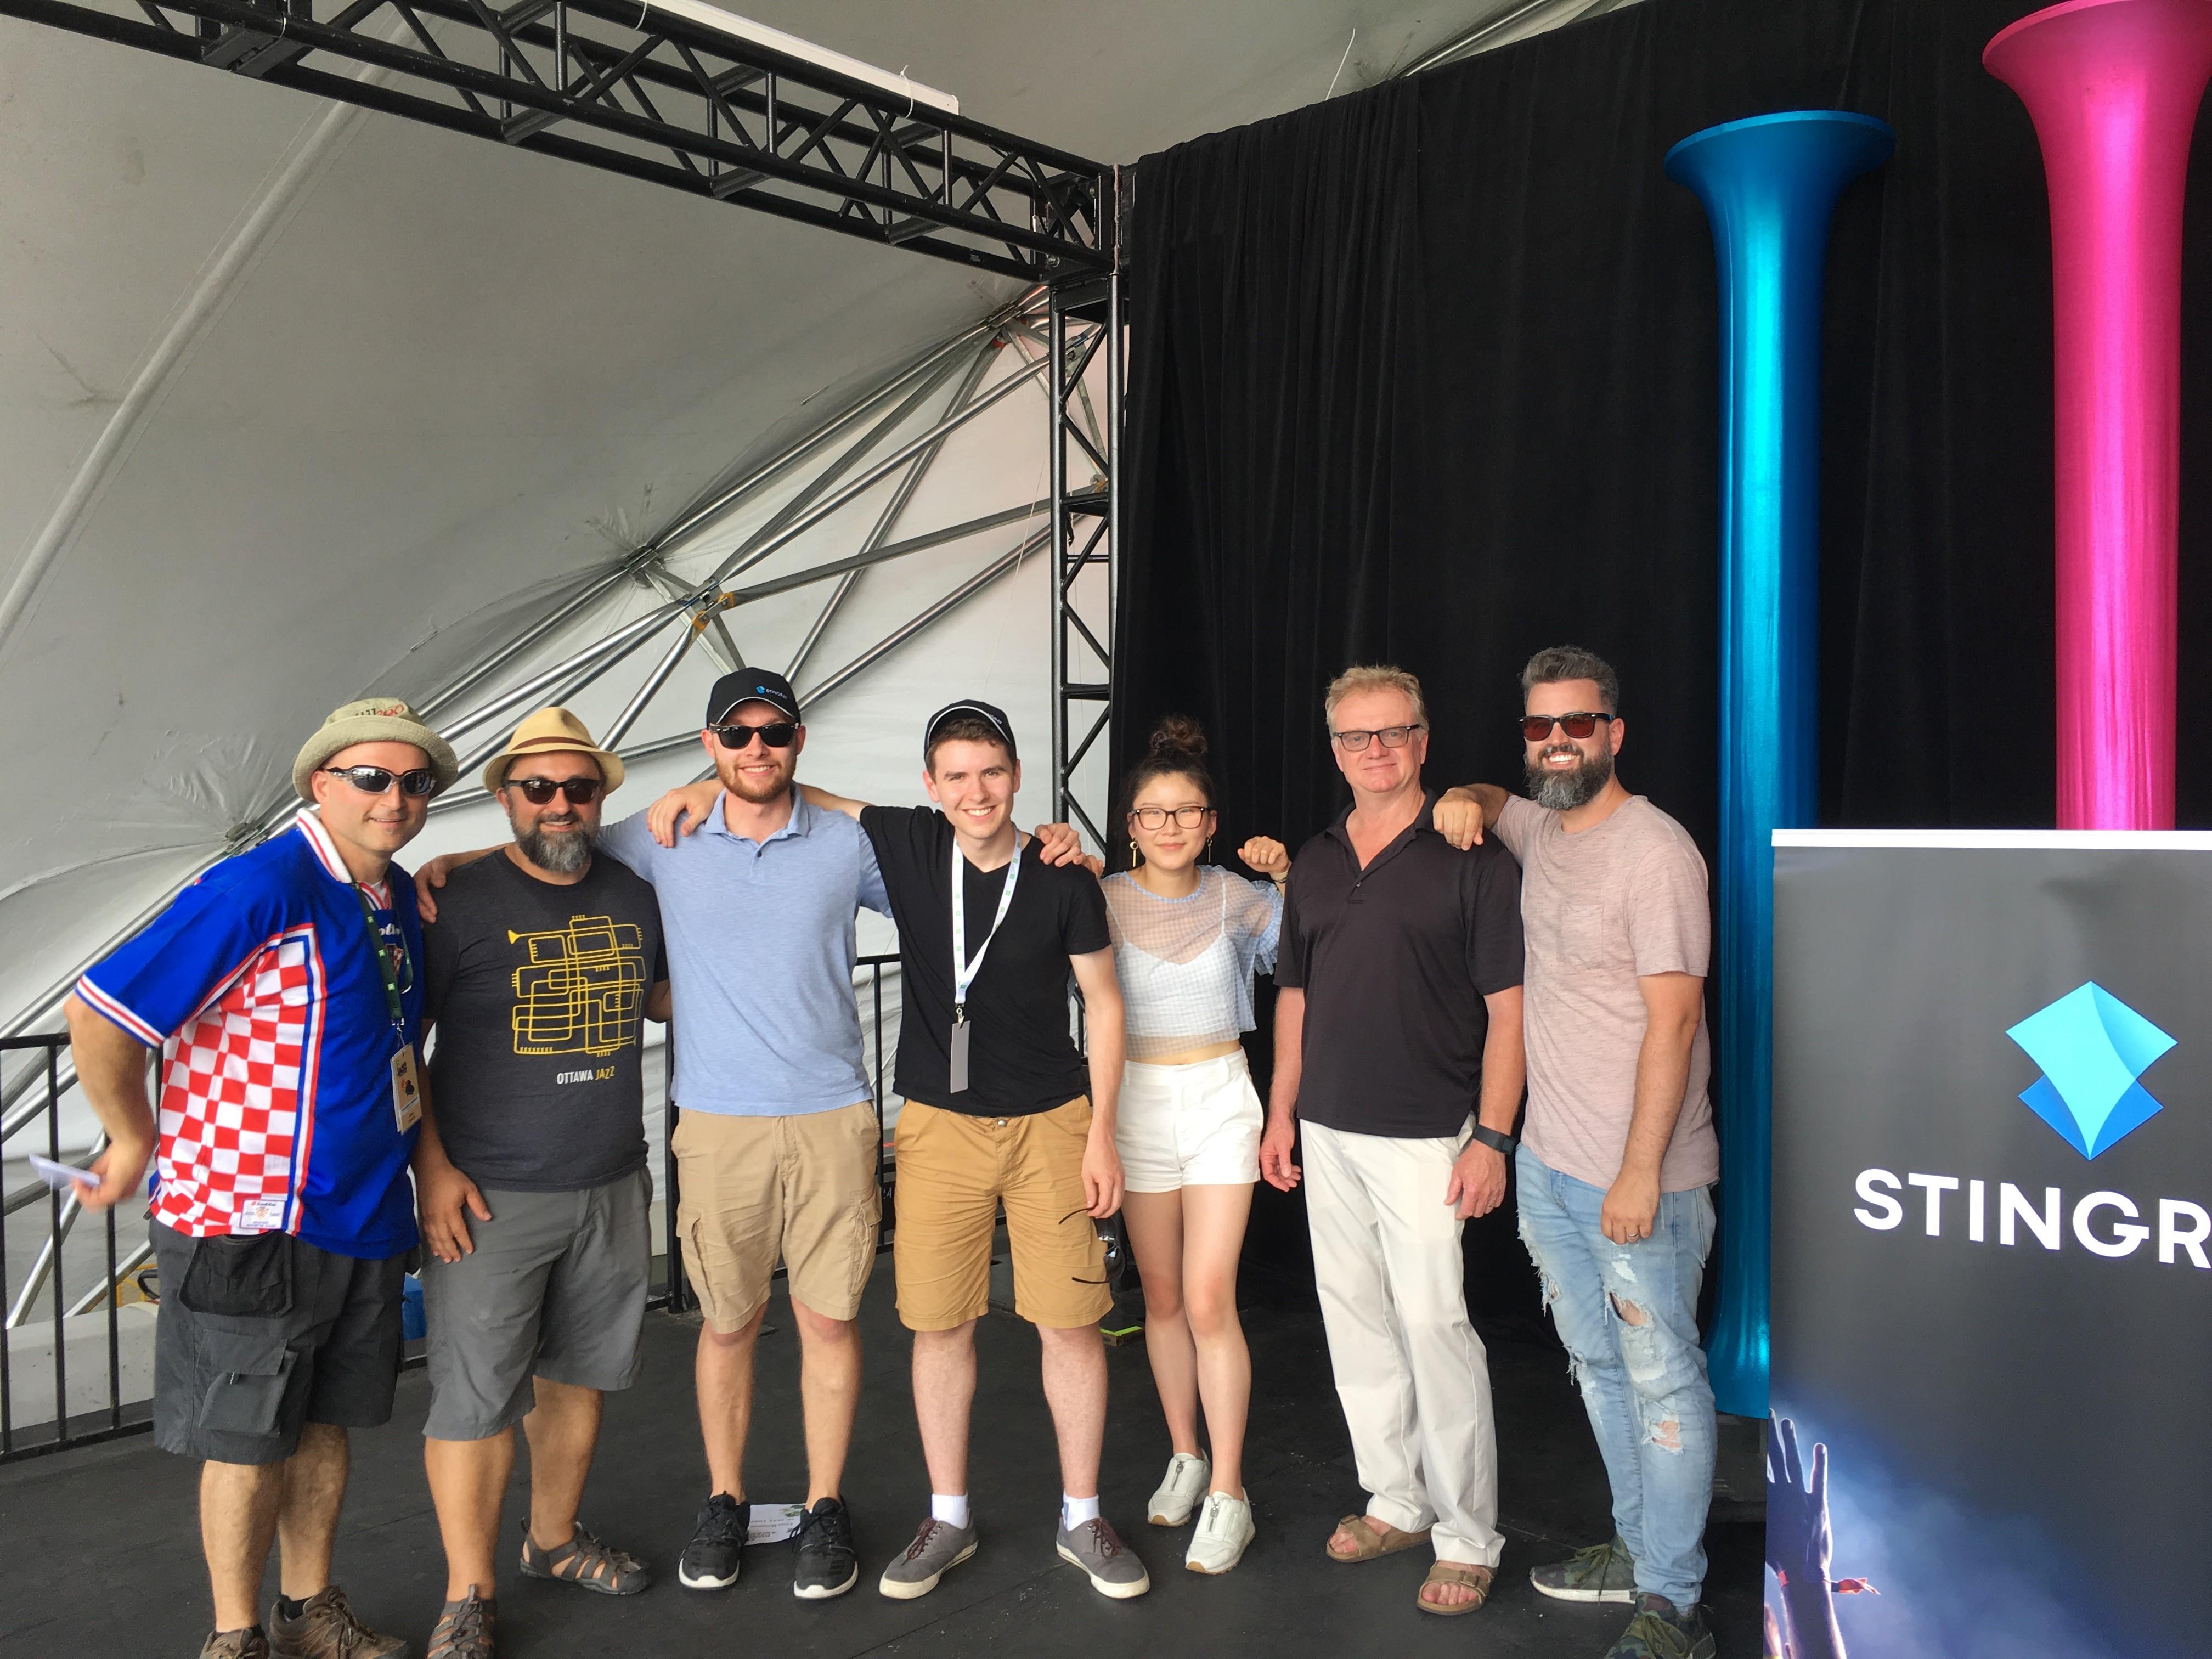 stingray-blog-ottawa-rising-stars